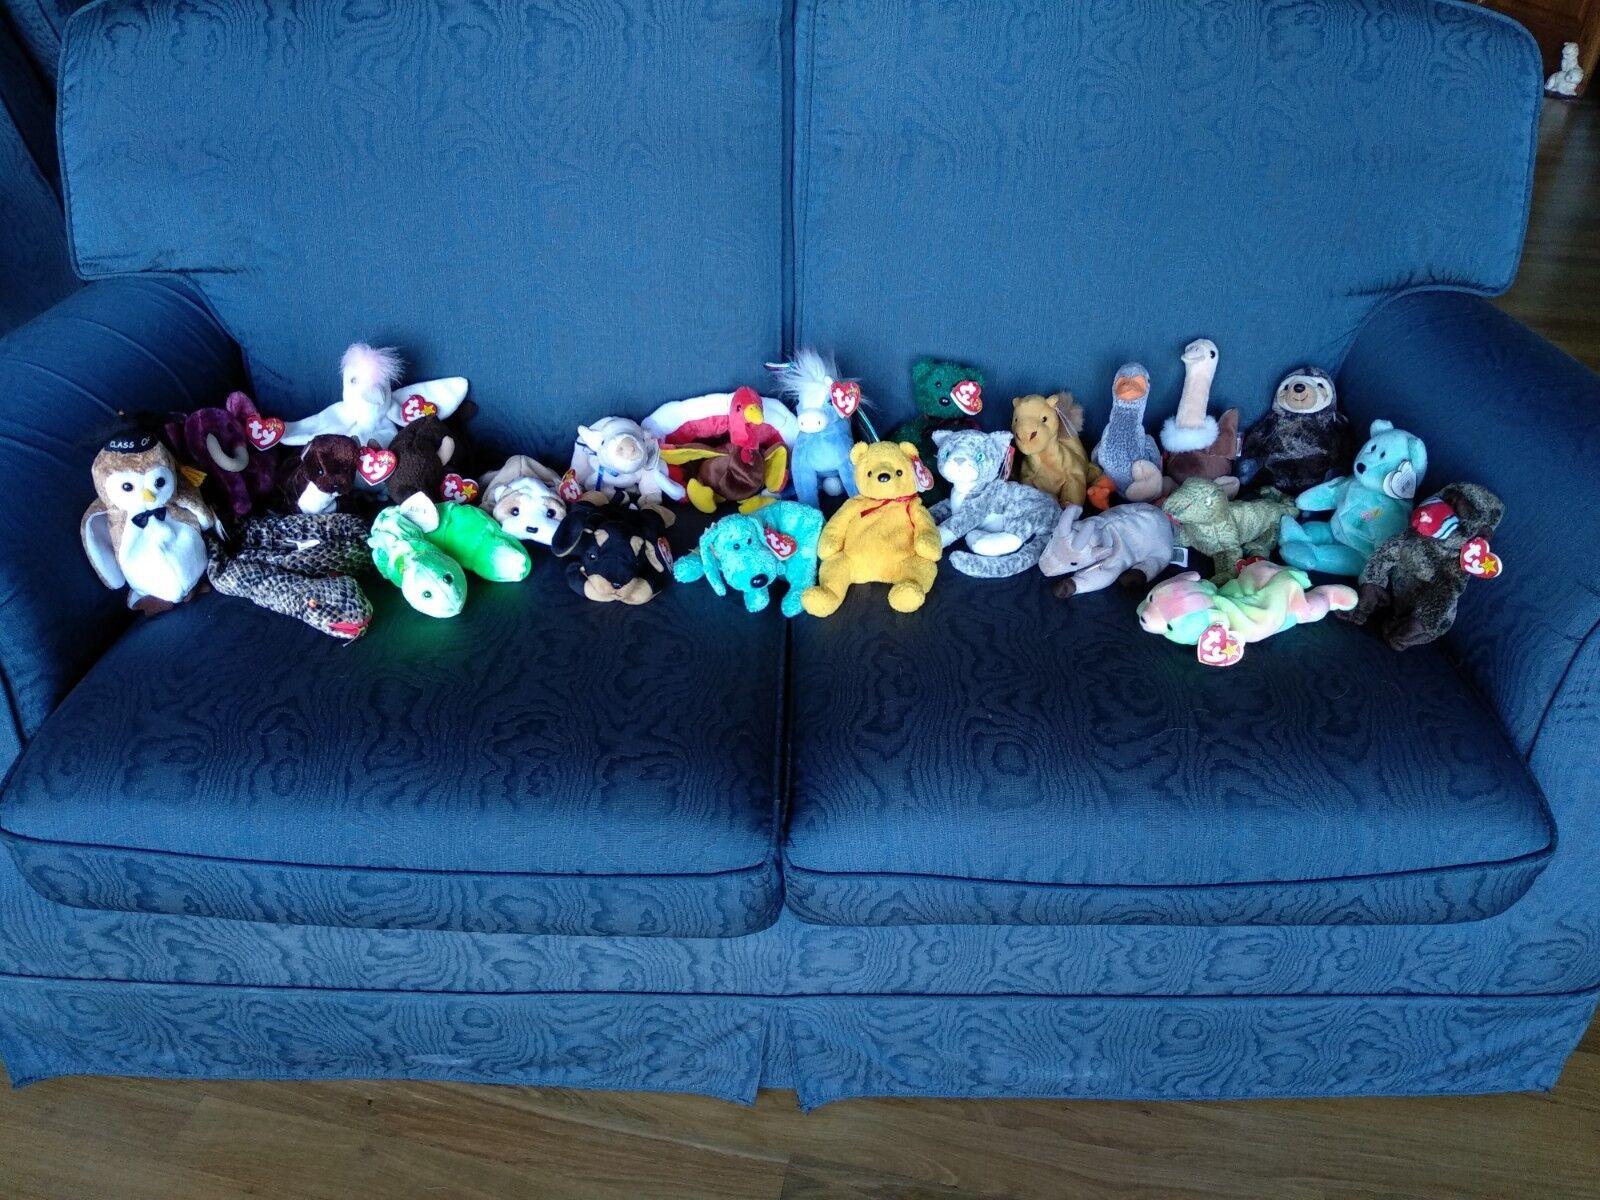 24 ty beanie etiquette babies collectable with original etiquette beanie 0c318a